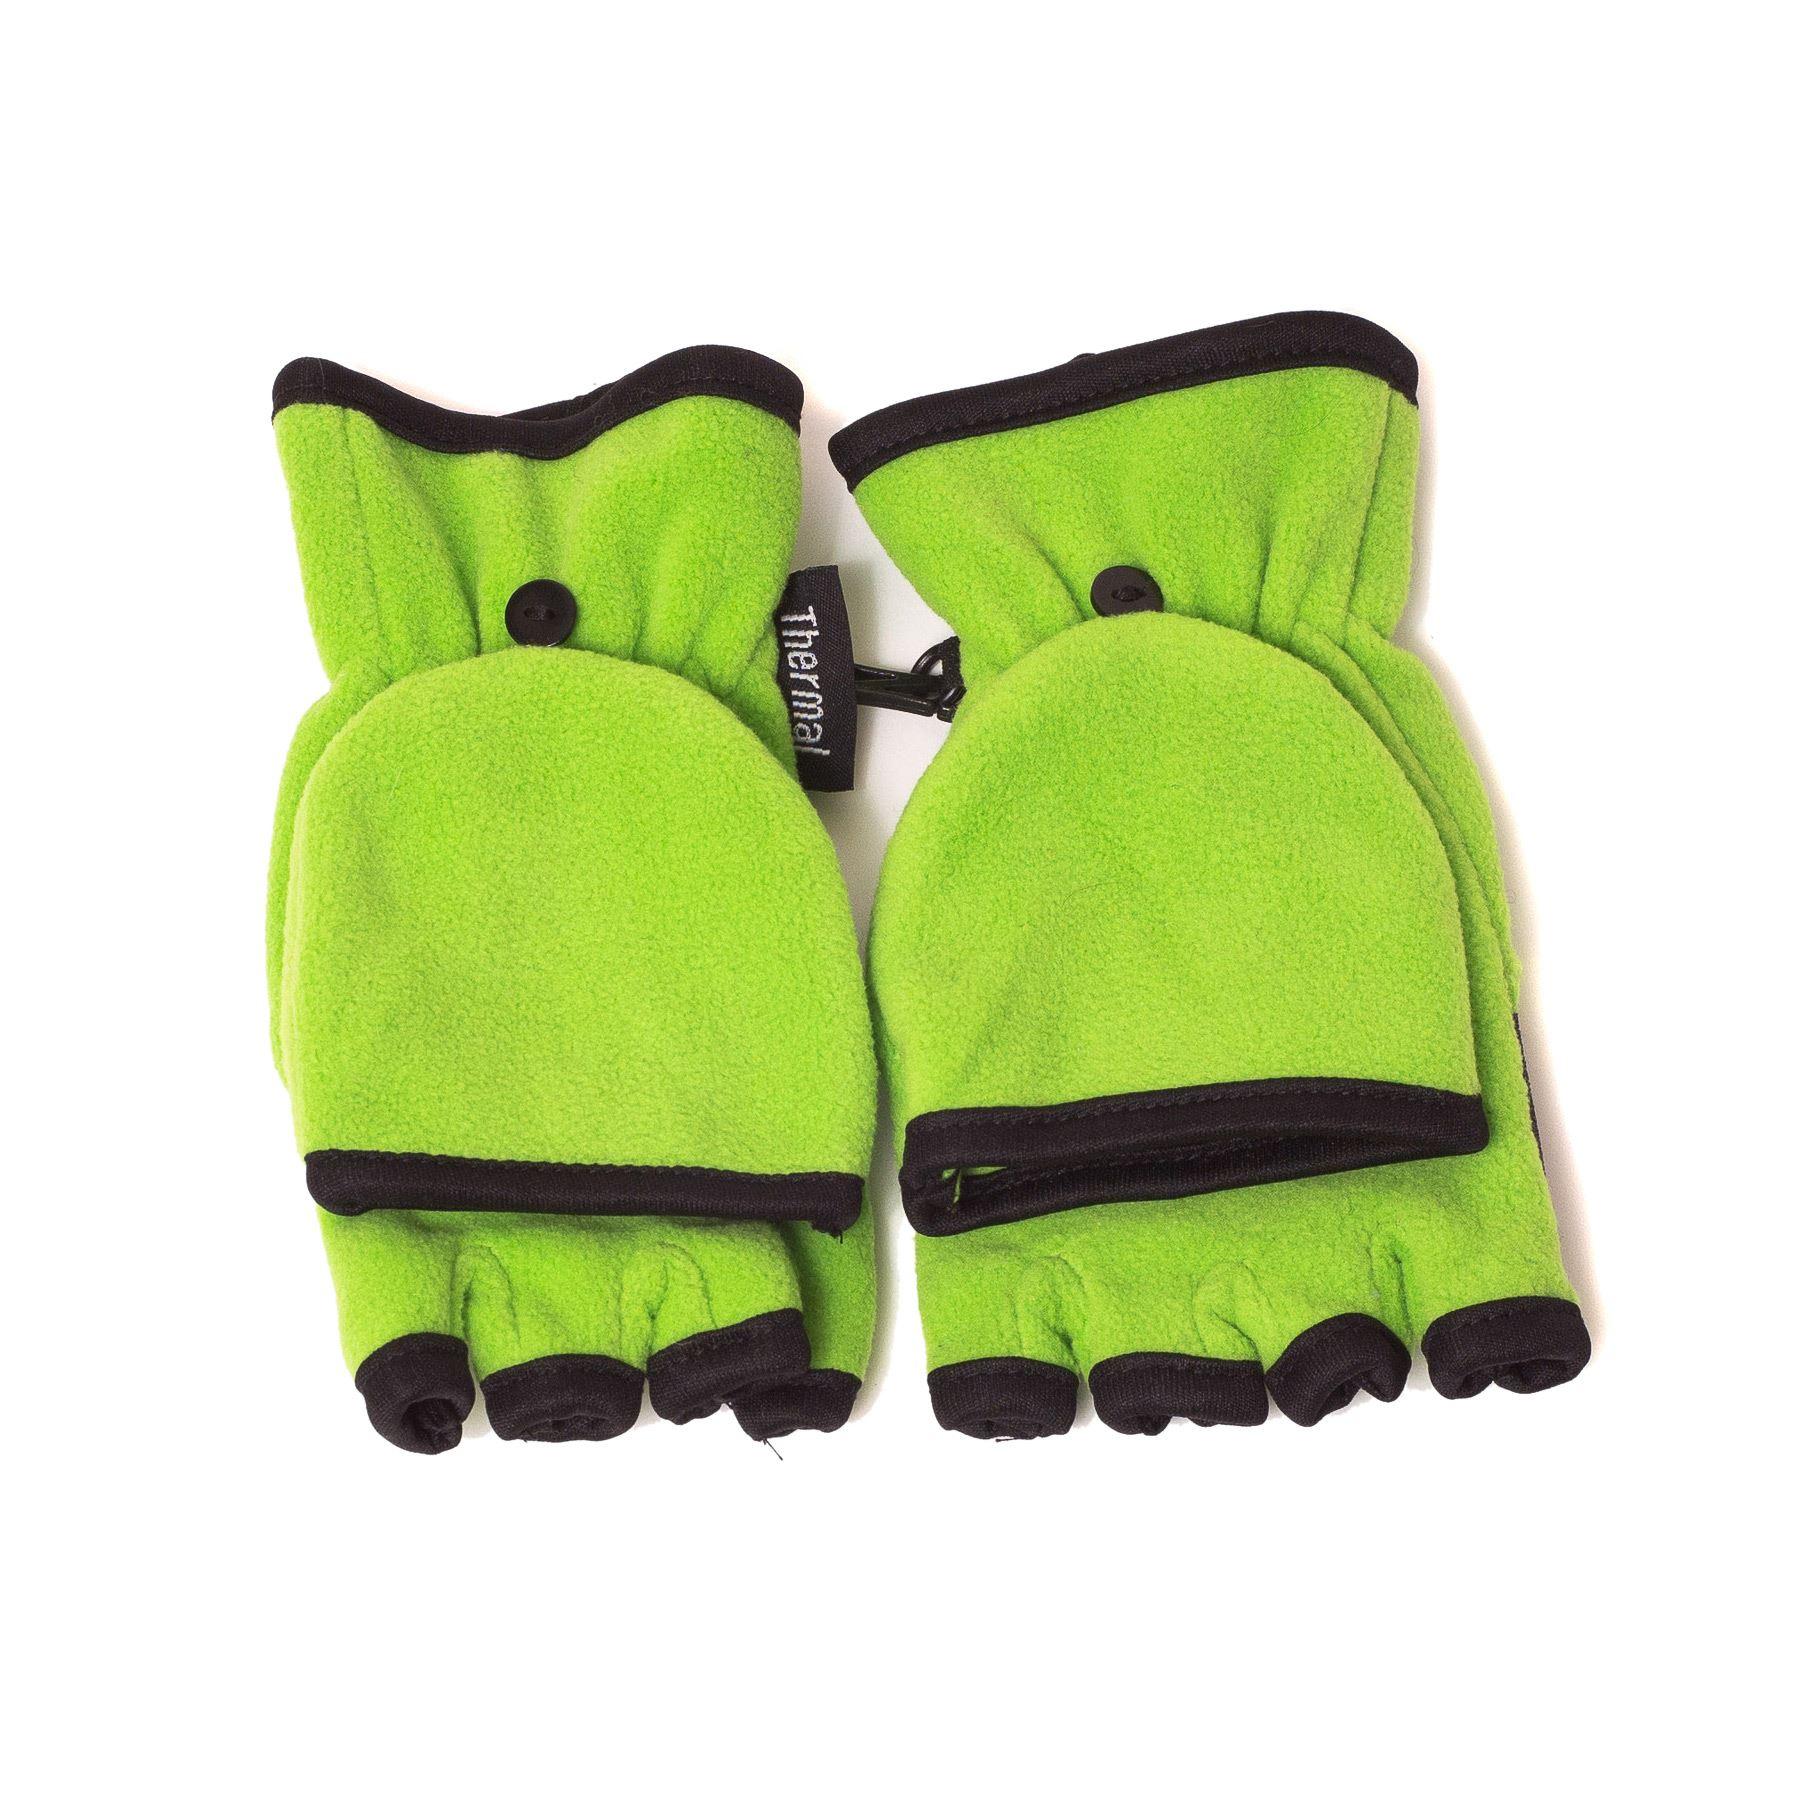 Fingerless driving gloves ebay - Picture 2 Of 3